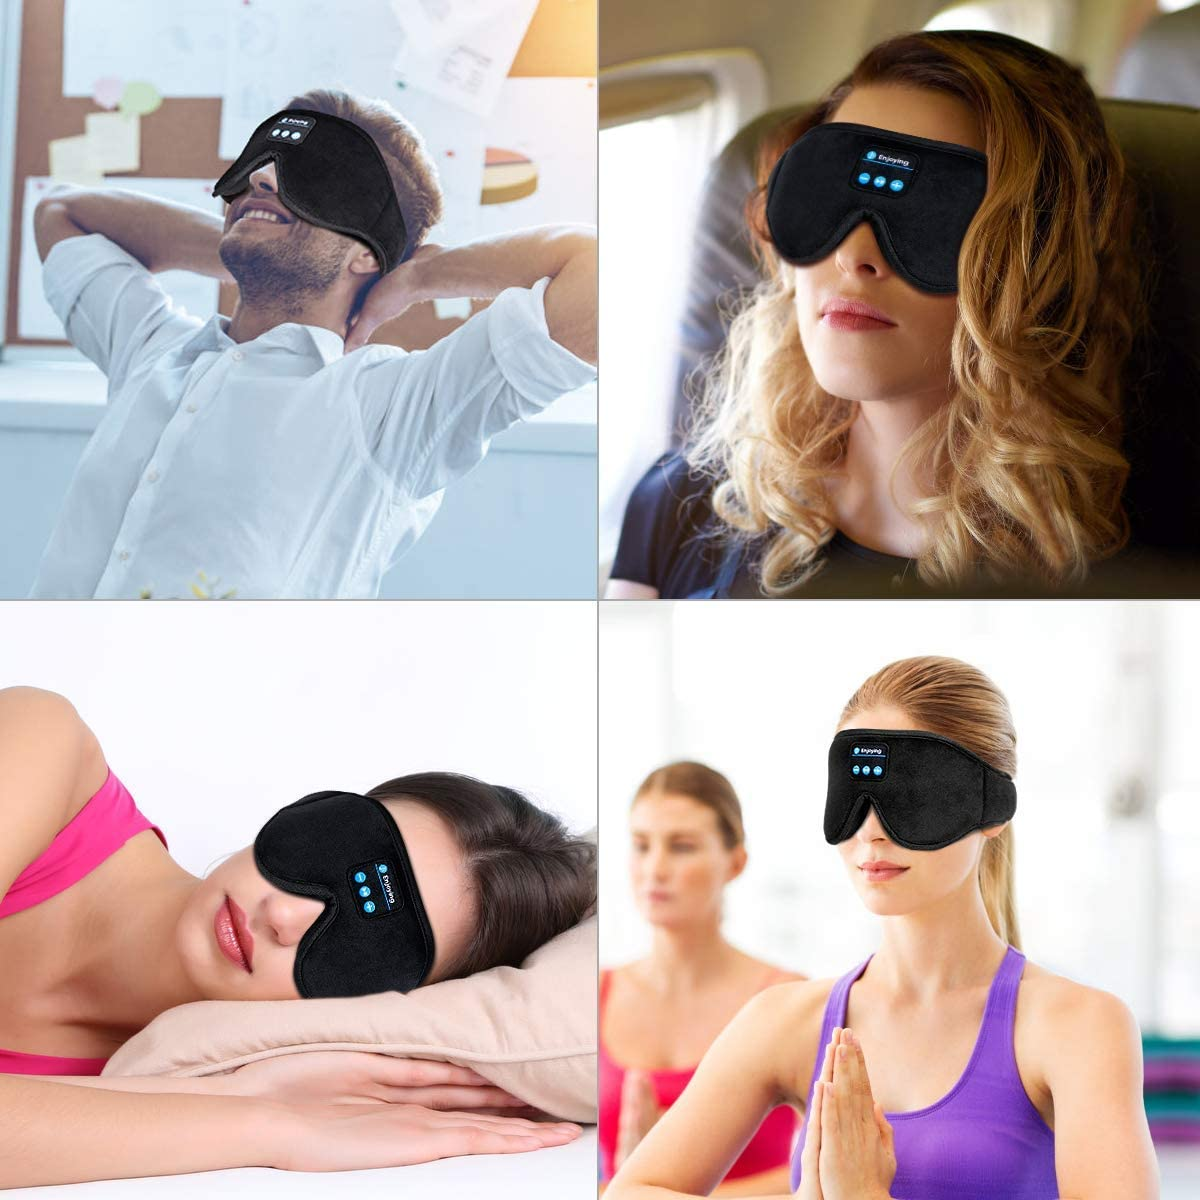 This sleeping eye mask has built-in bluetooth headphones, The Manc